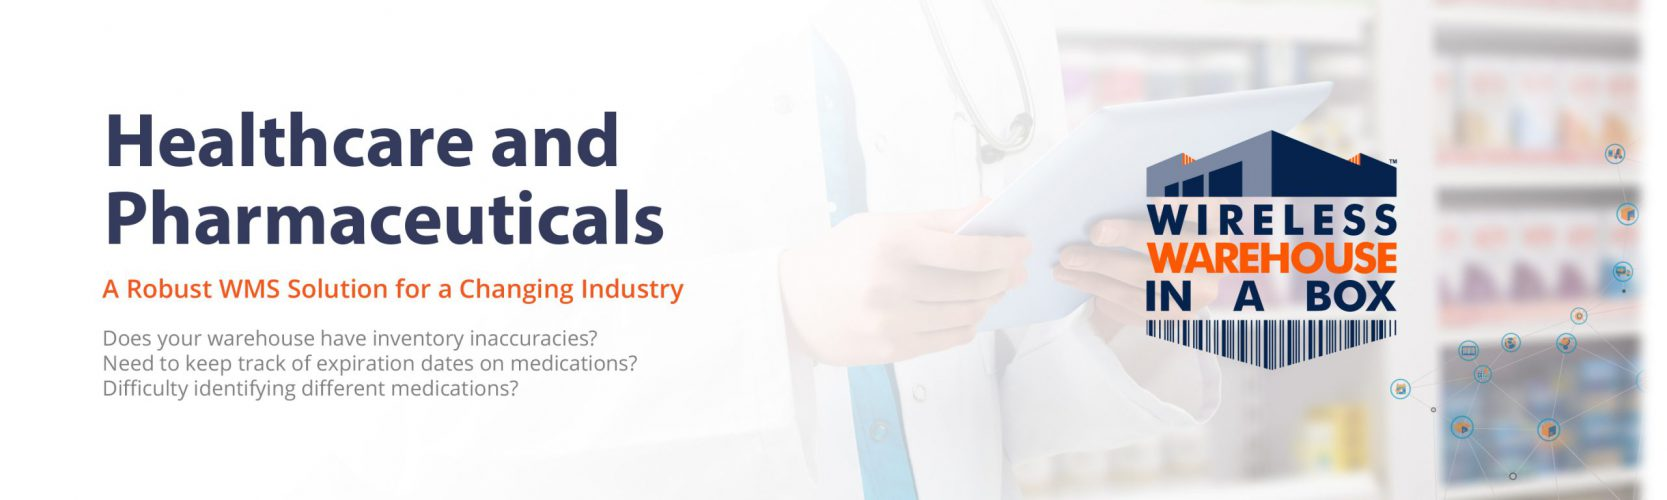 Healthcare_Header_Content